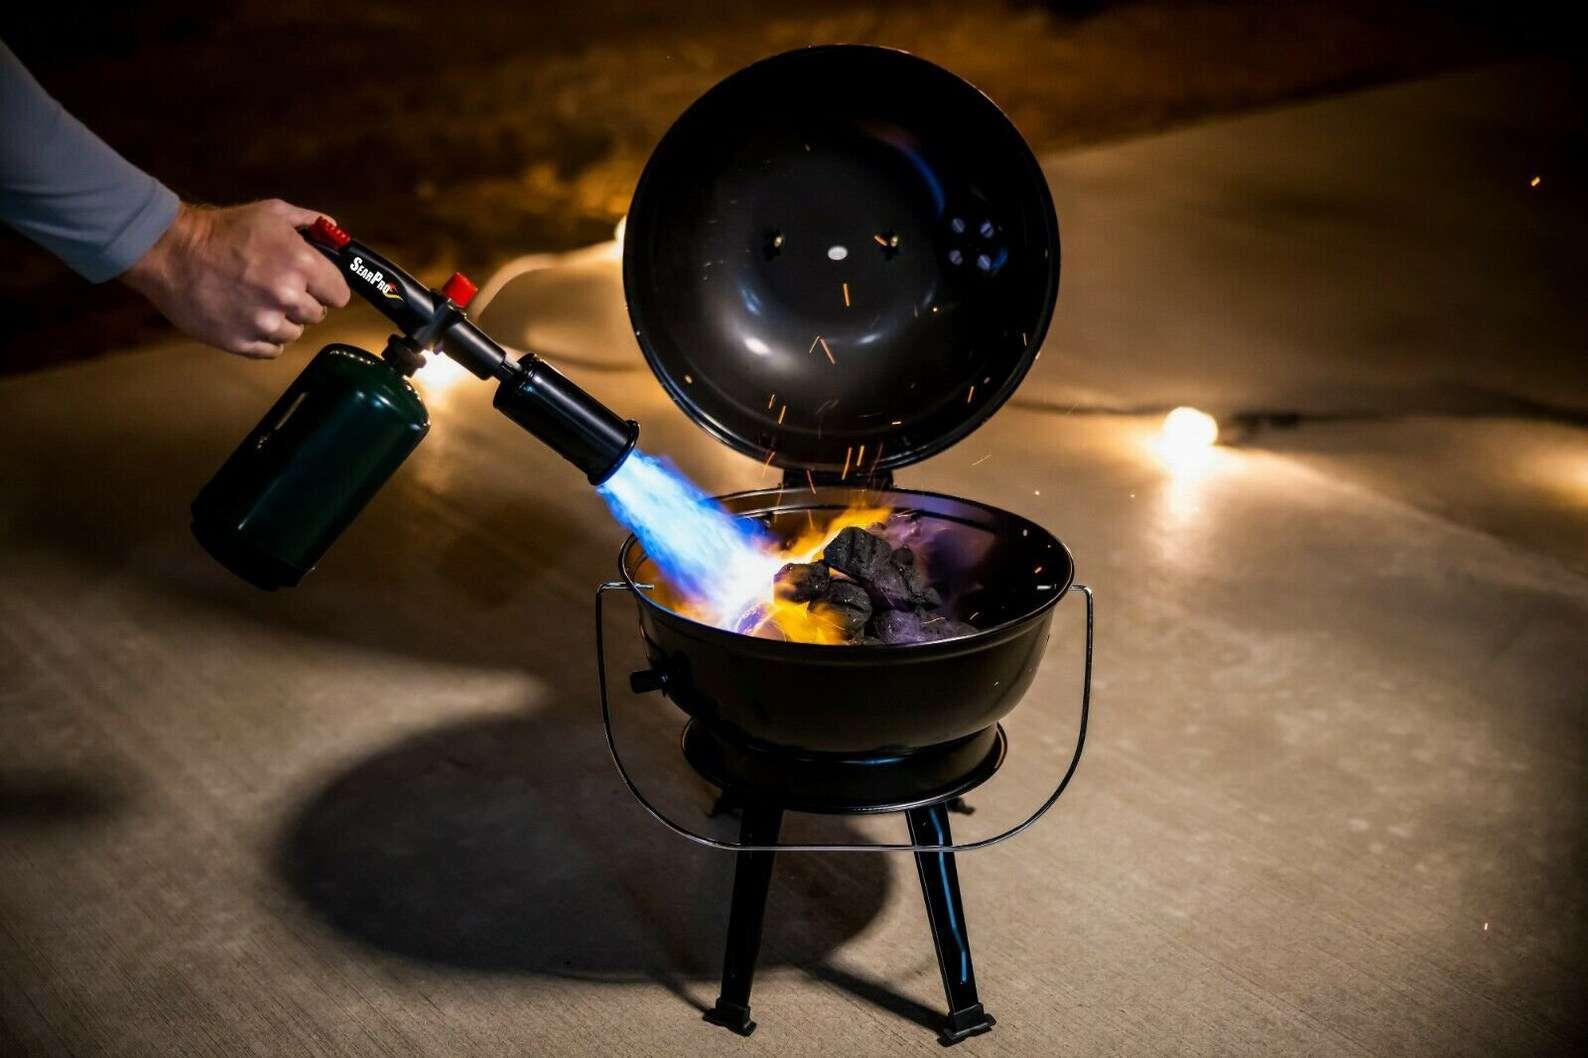 SearPro Multi-Use Cooking Torch